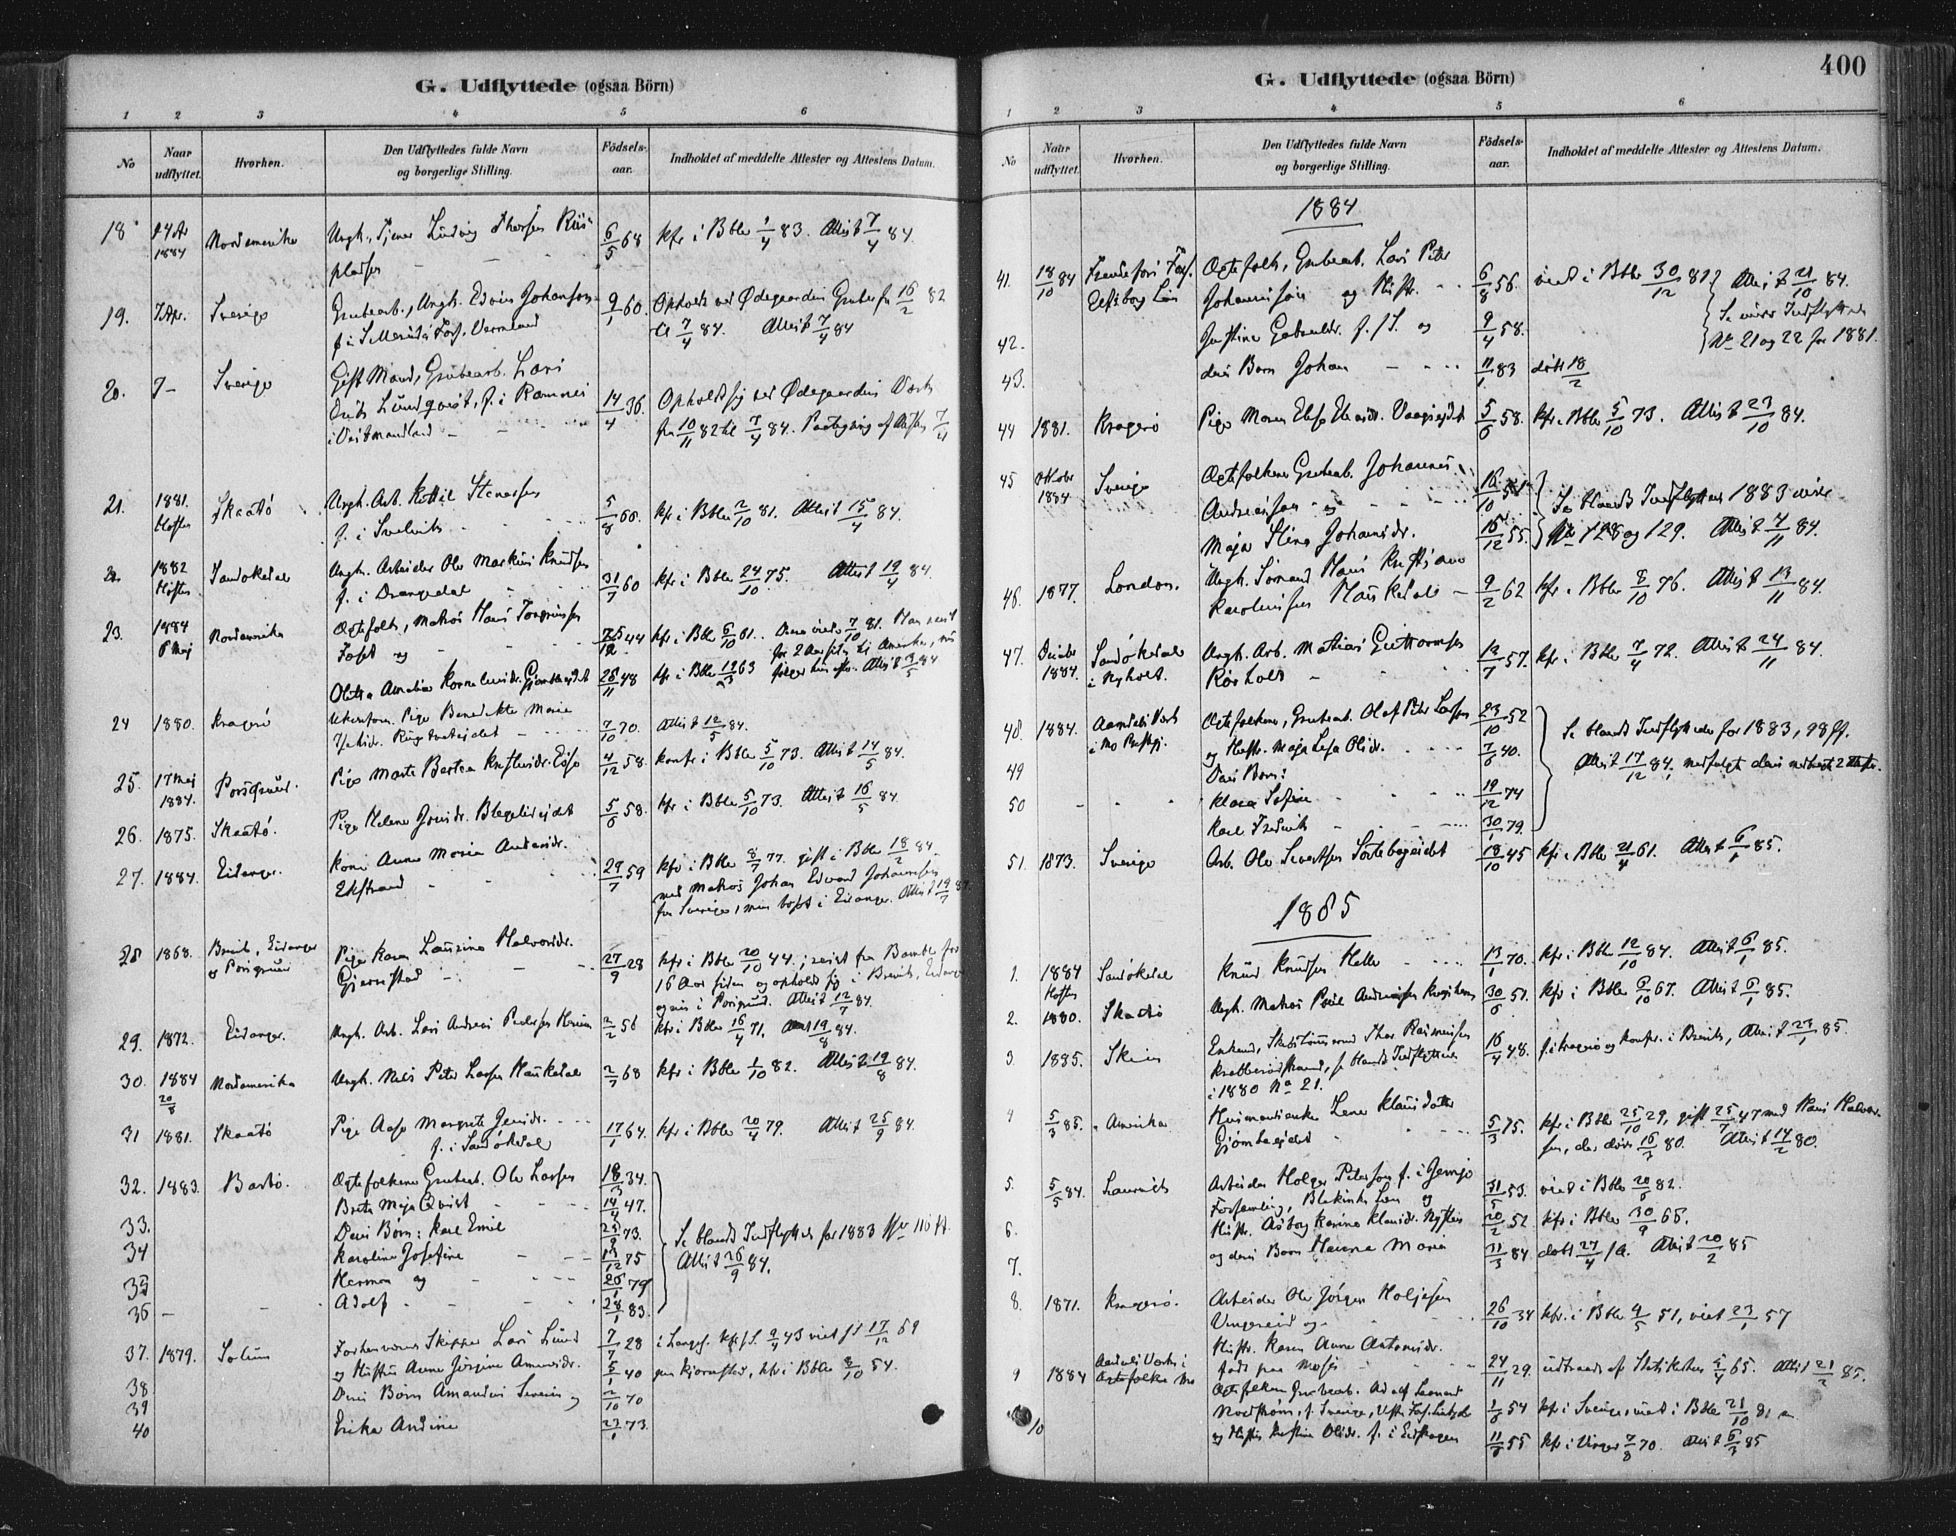 SAKO, Bamble kirkebøker, F/Fa/L0007: Ministerialbok nr. I 7, 1878-1888, s. 400